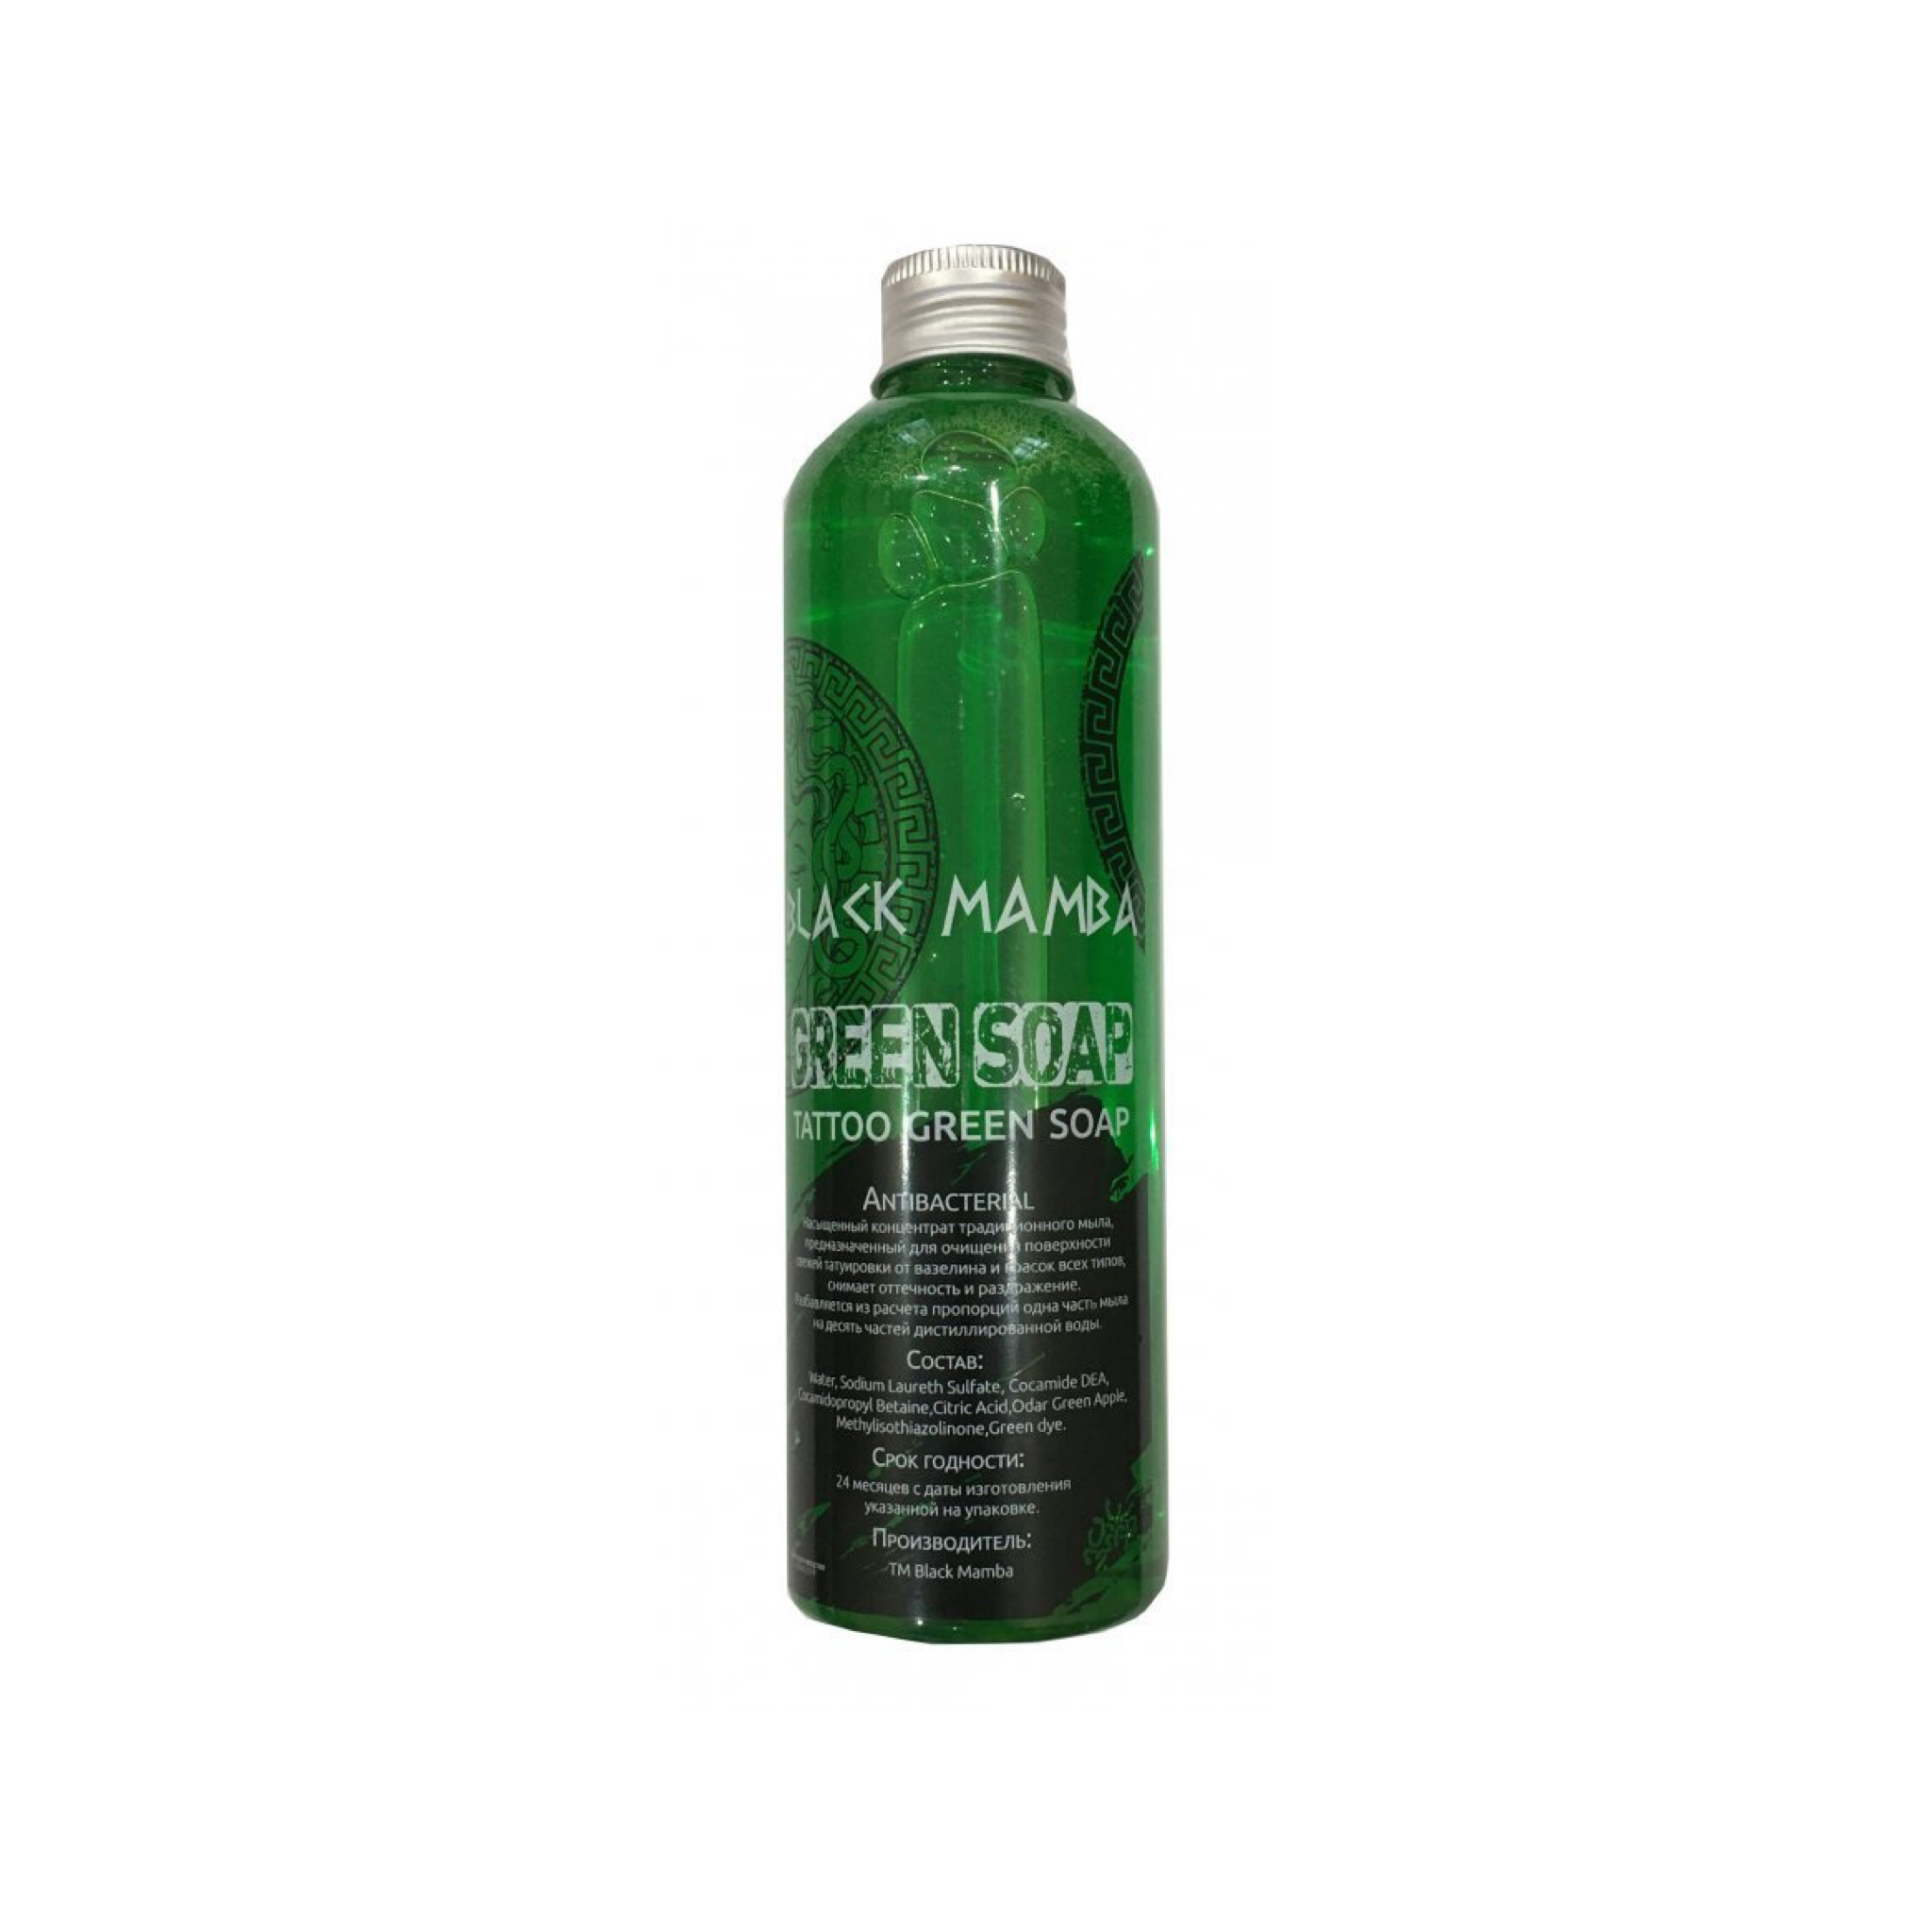 Black Mamba Green Soap, 250 ml